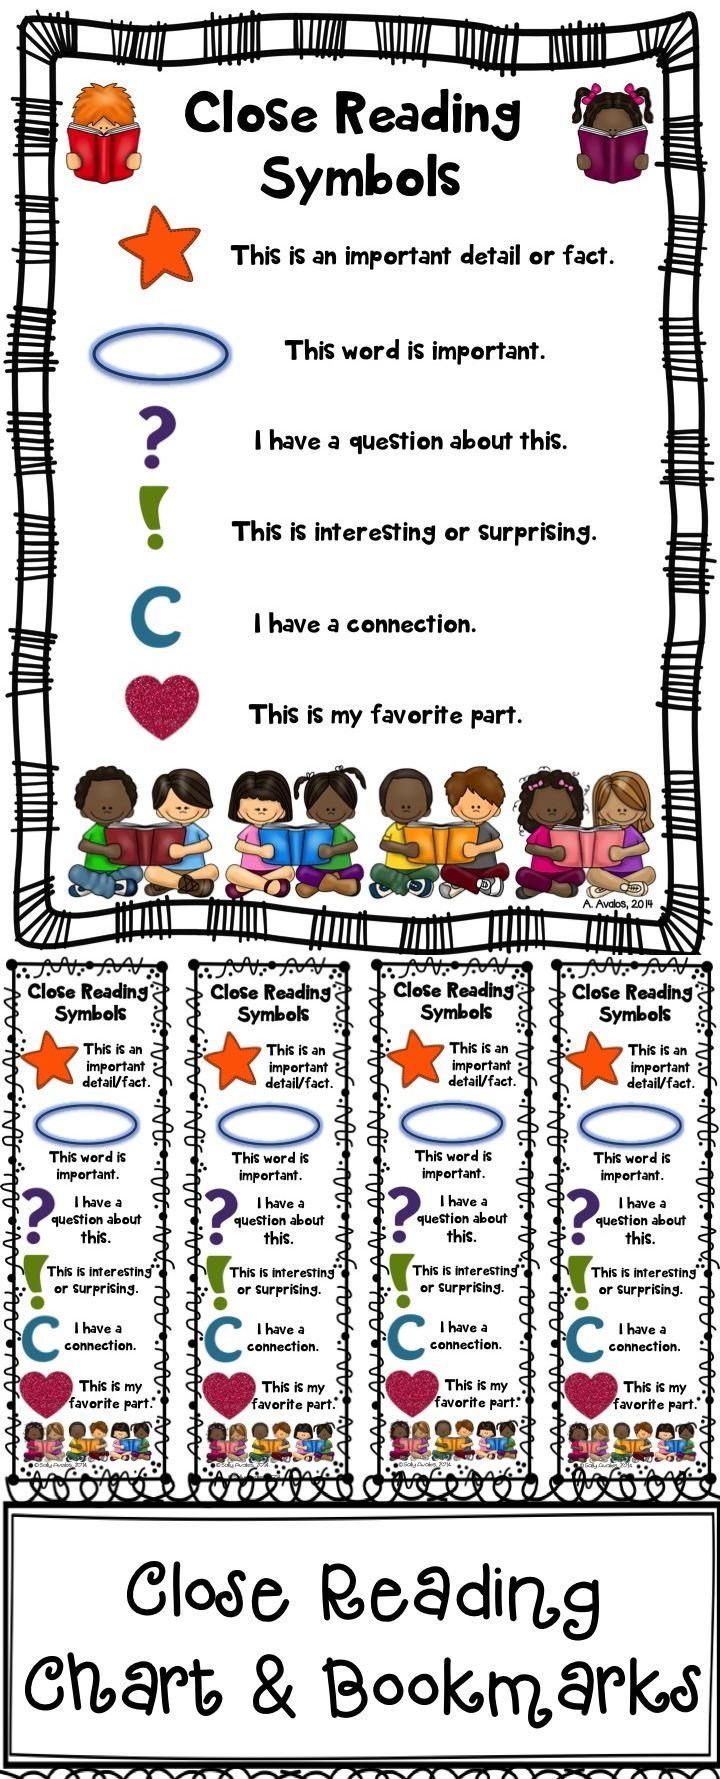 Close Reading Symbols Charts Bookmarks Bundle Christmas Winter Close Reading Lessons Close Reading Symbols Reading Lessons